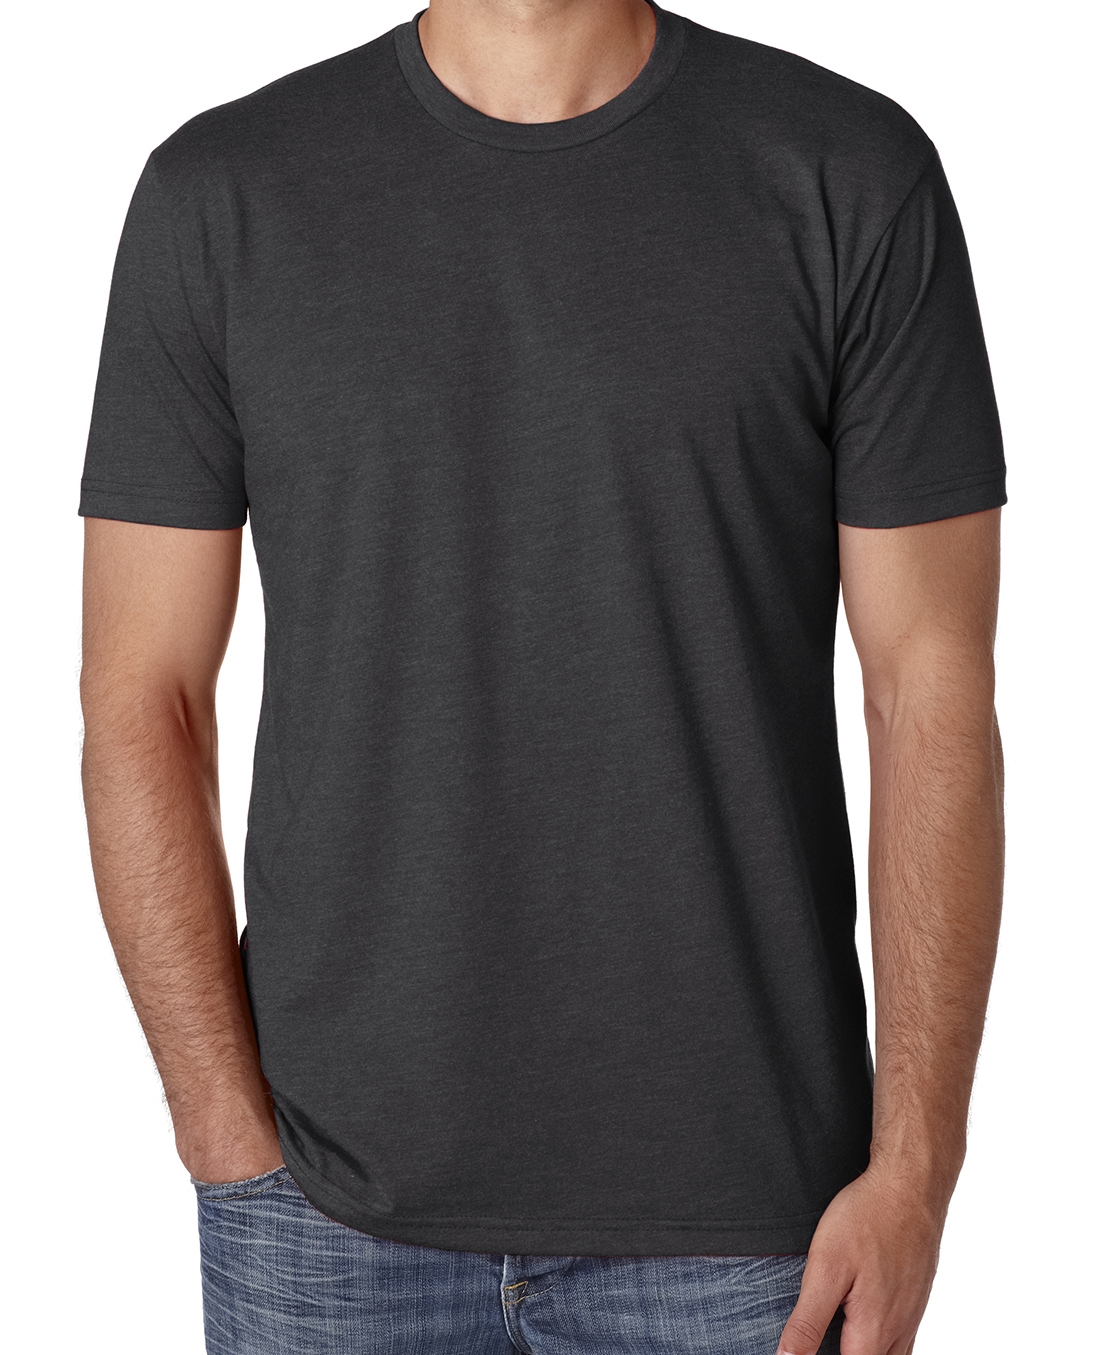 uaUnisex CVC crew neck t-shirt (cotton polyester blend, great fit, very soft, $$).